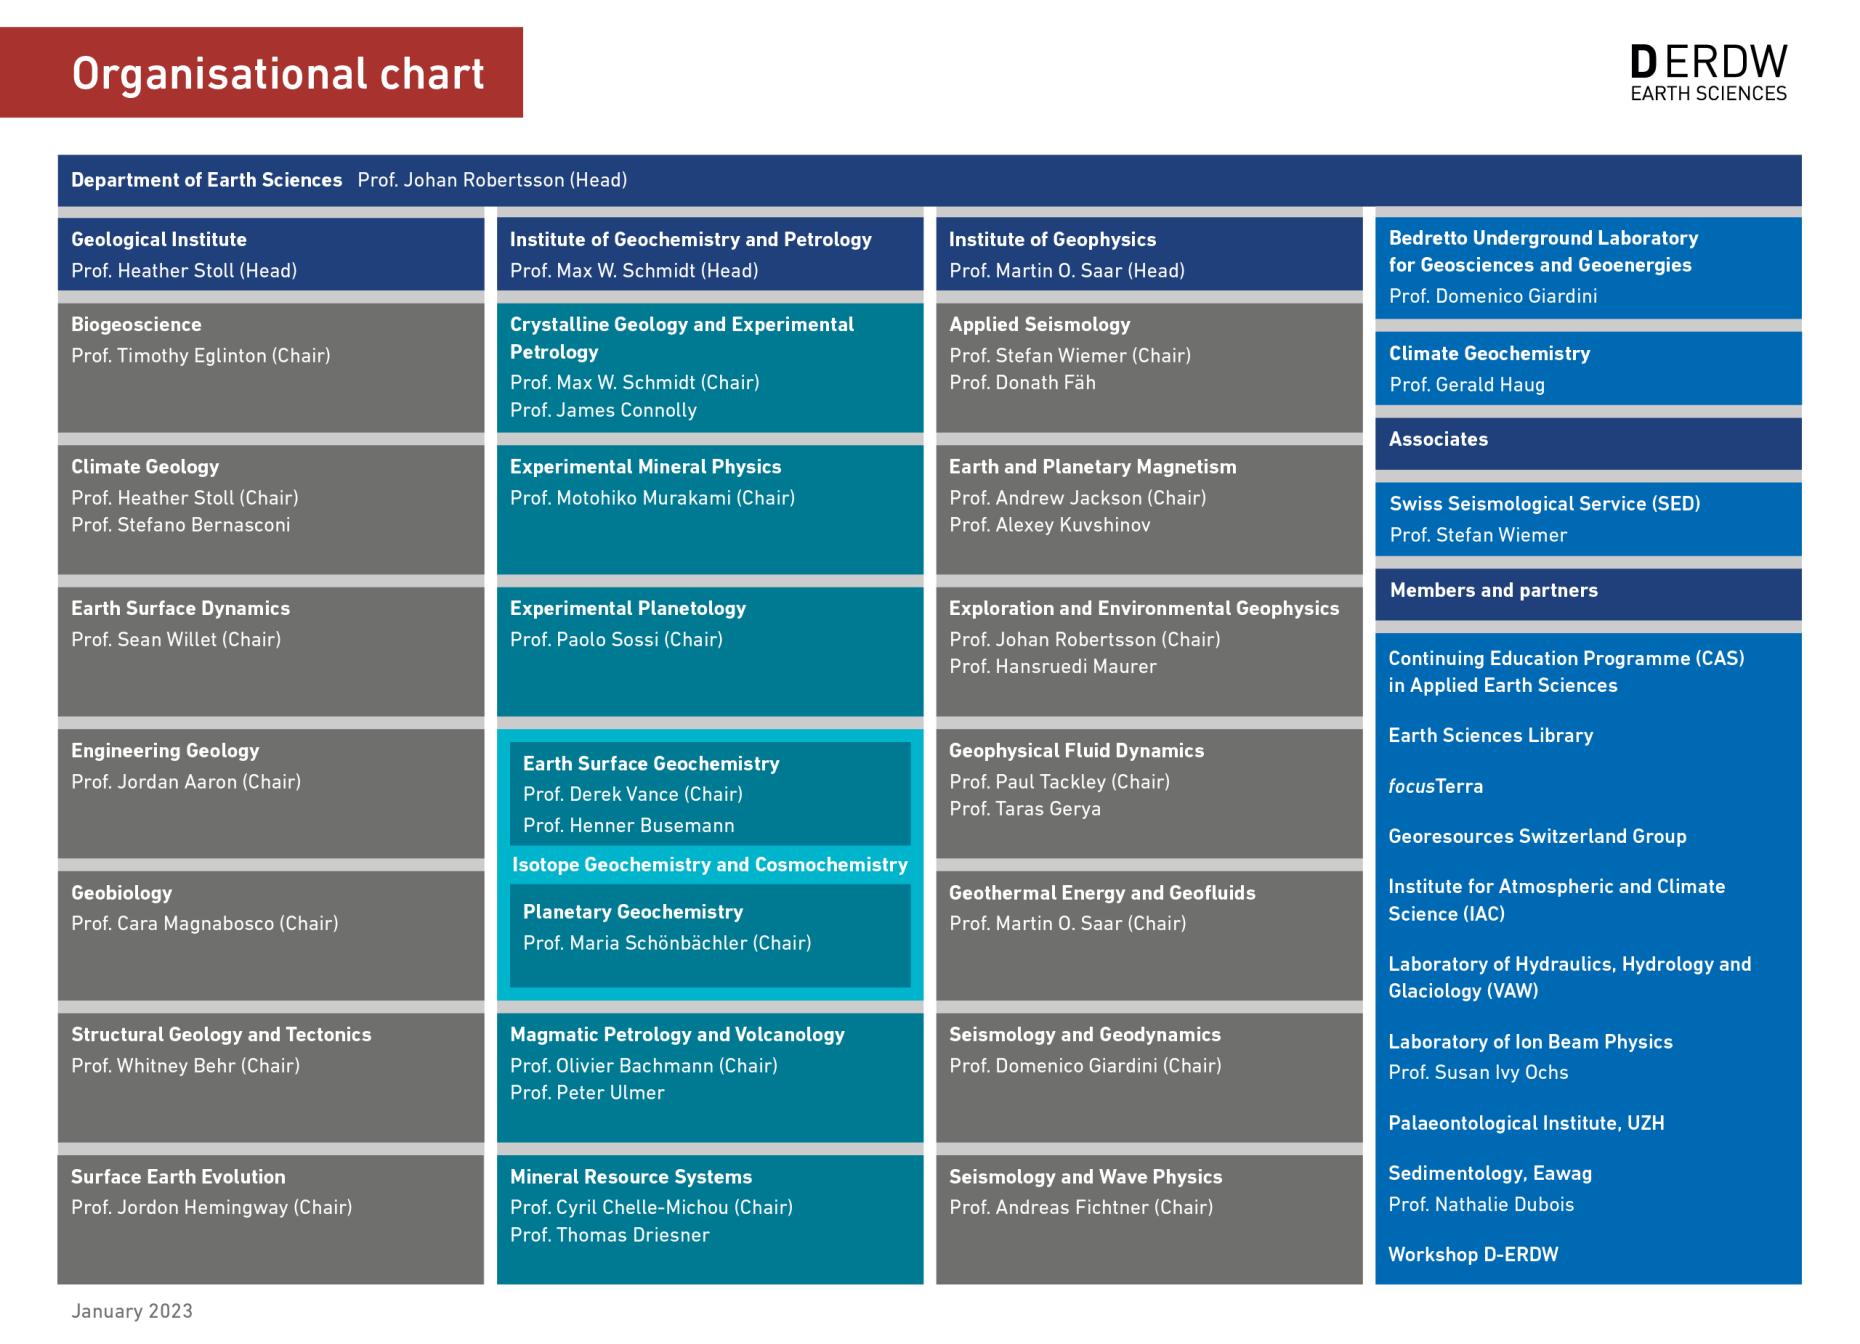 Organisation chart Institutes and Groups (D-ERDW)